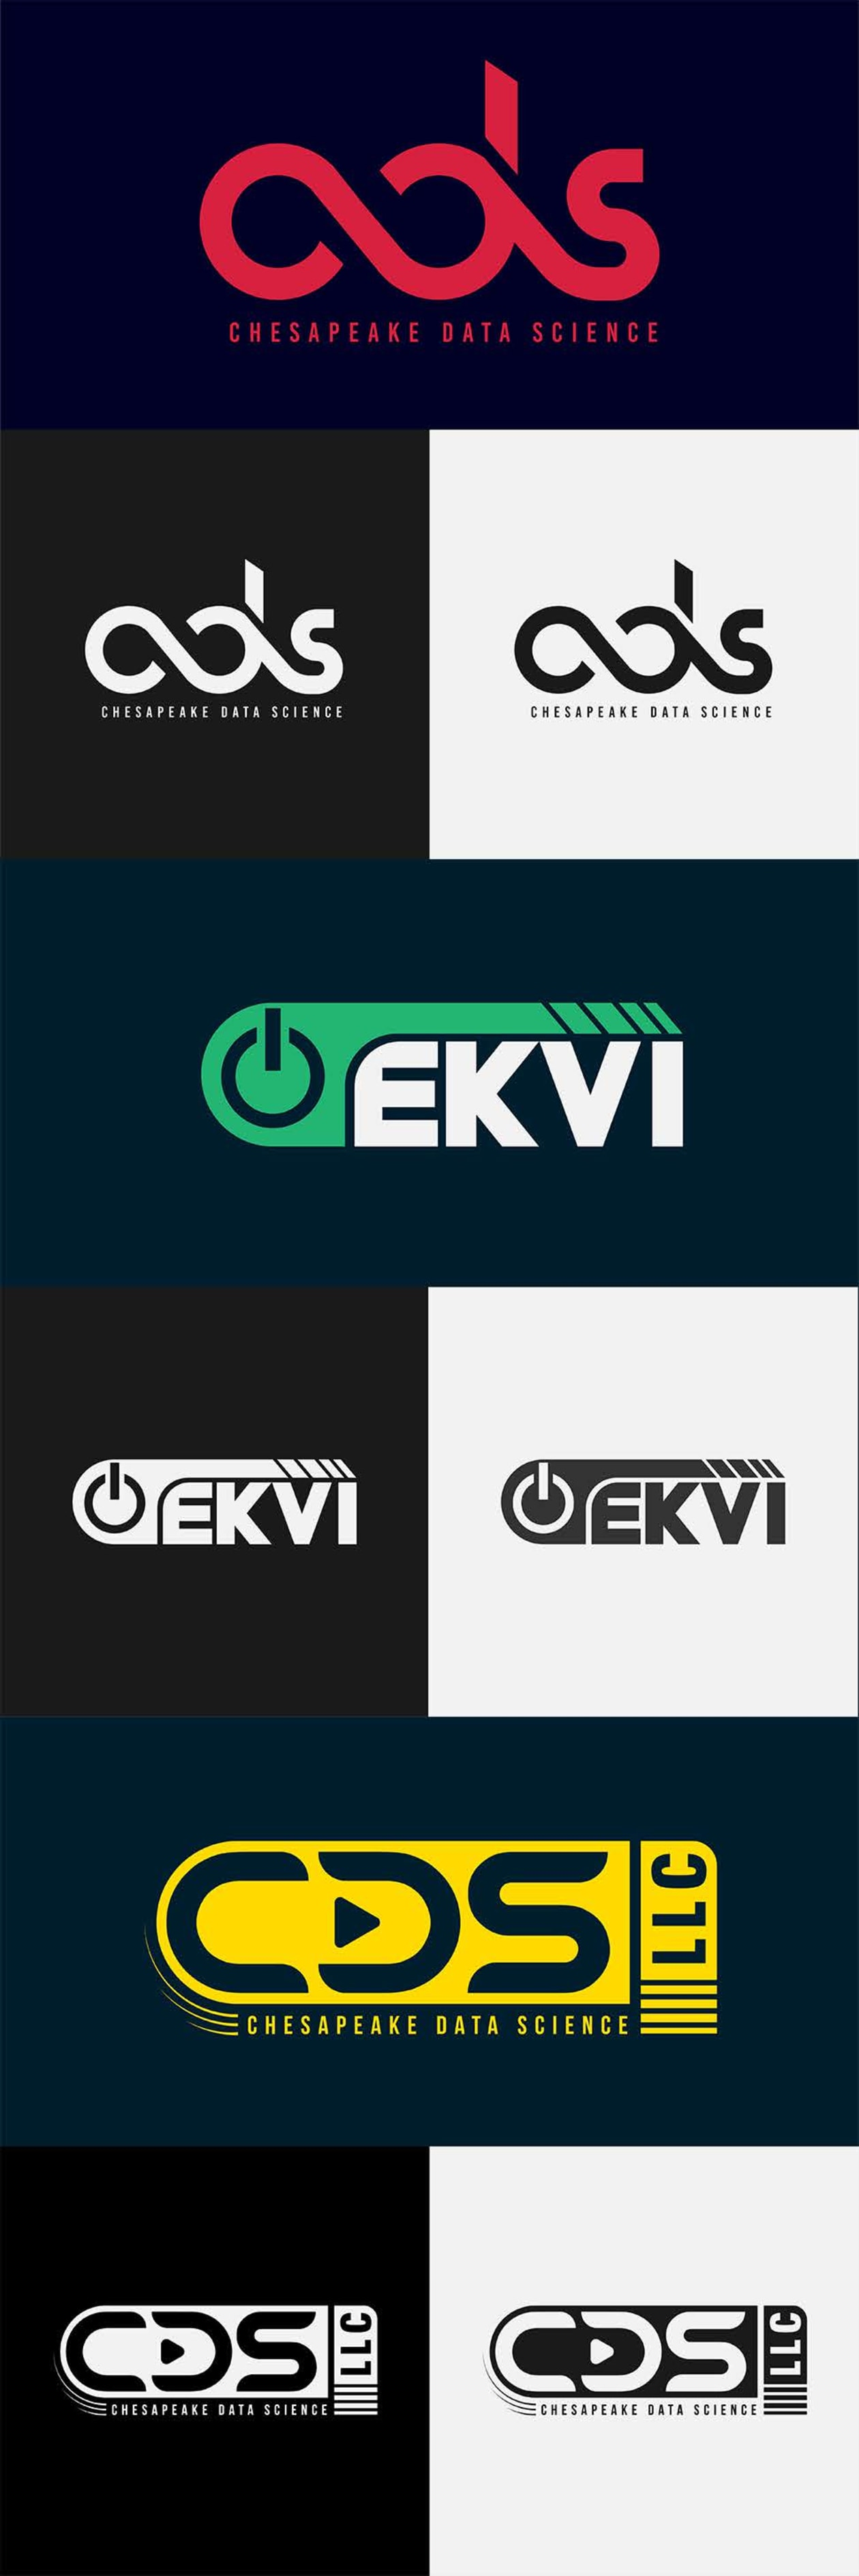 I will design creative and professional text logo design